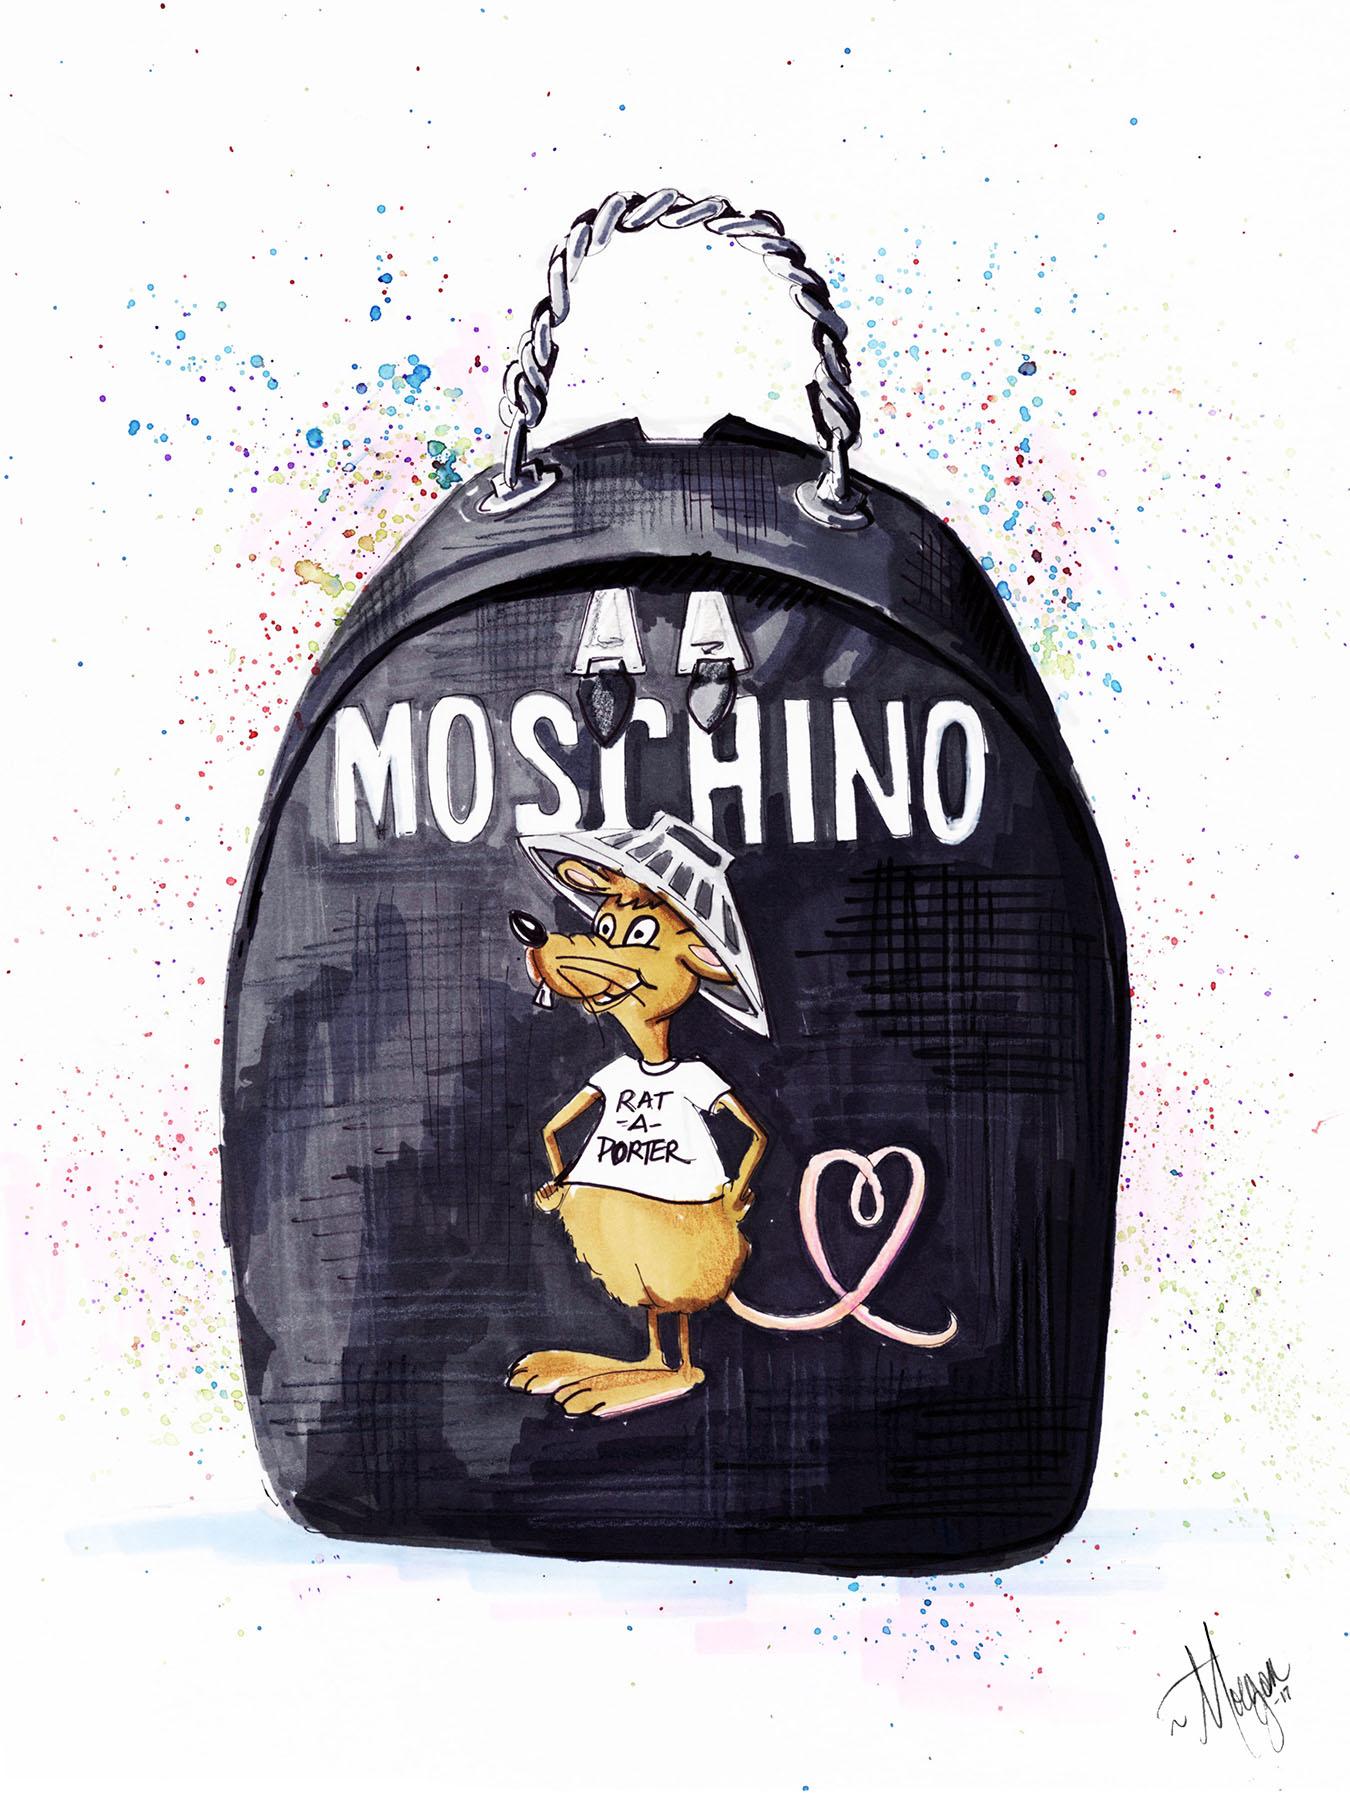 moschino-backpack-illustration-morgan-swank-studio.jpg